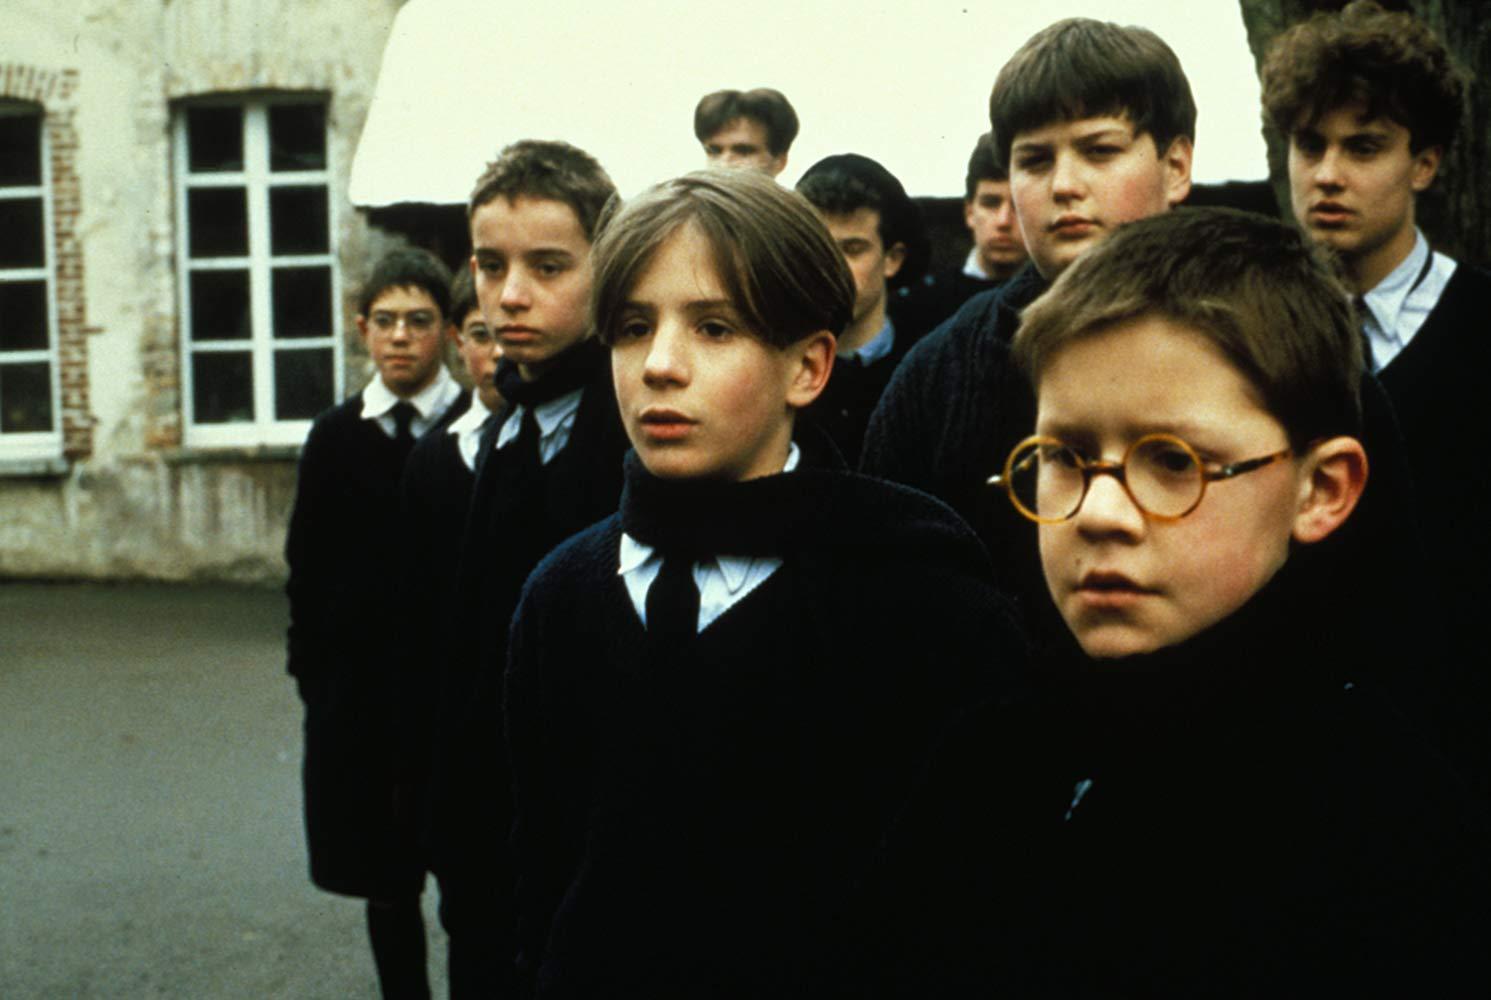 مشاهدة فيلم Au revoir les enfants 1987 HD مترجم كامل اون لاين